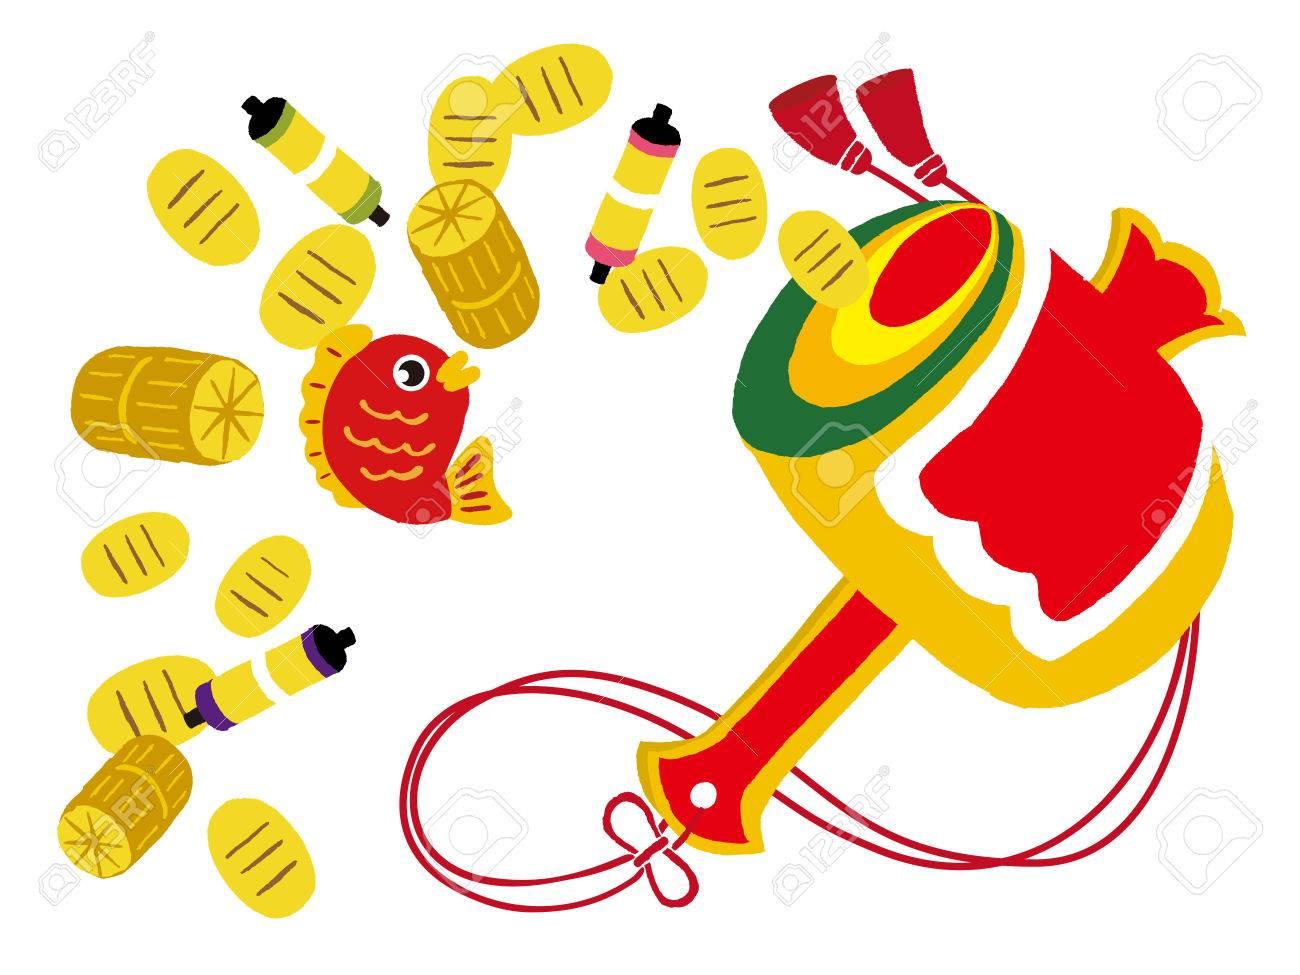 koban, good fortune, gold coins, mallet, red snapper, bag of rice - 63385364